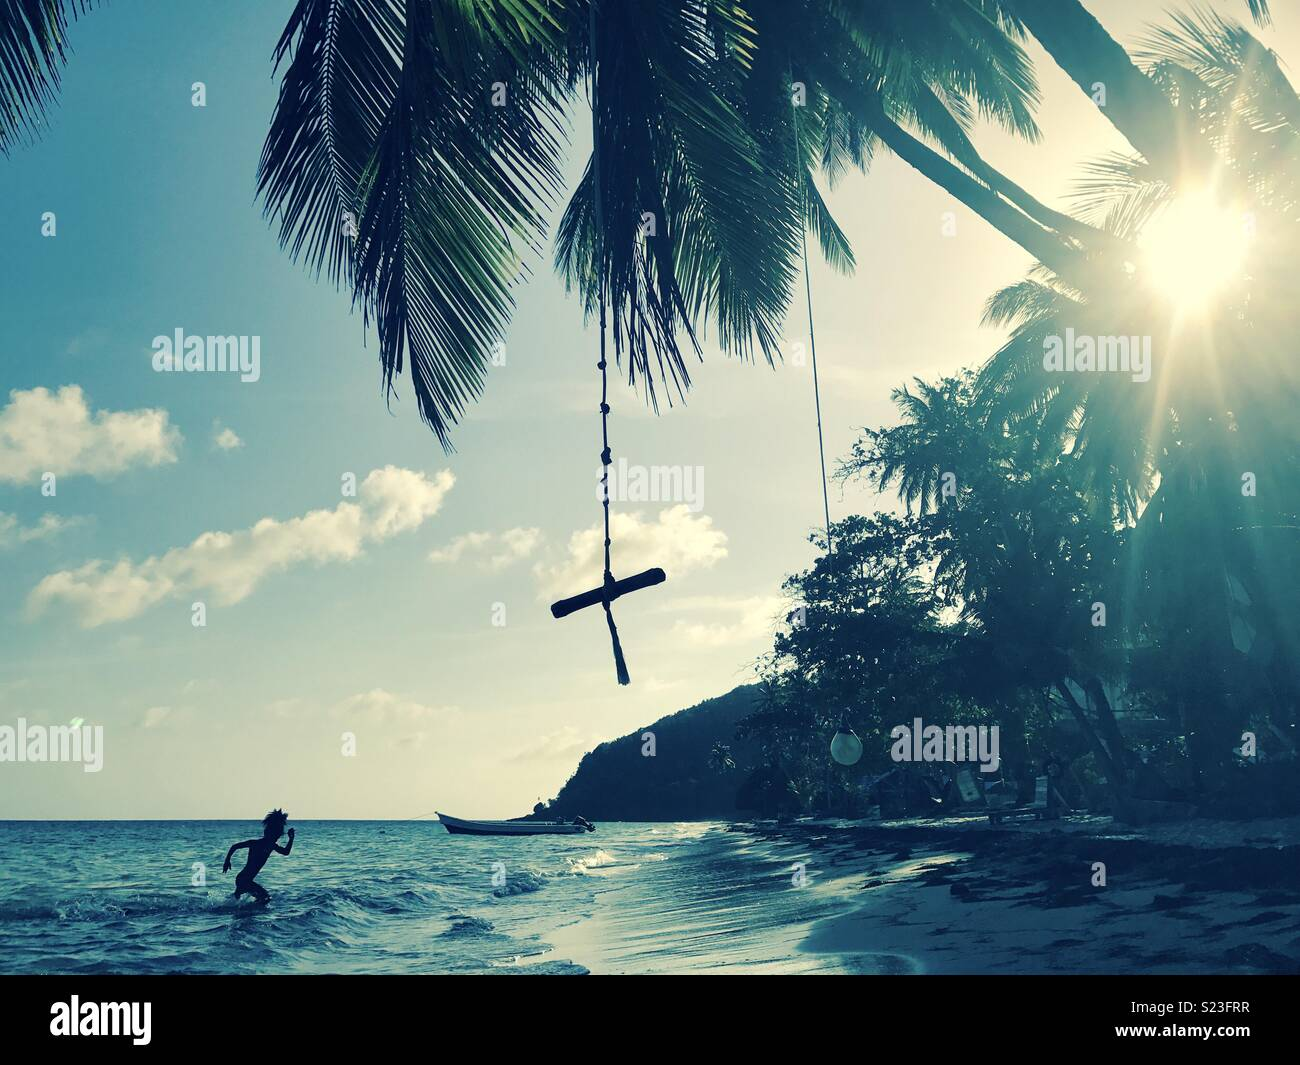 Caribbean beach scene on Providencia island, a Columbian island in the Caribean. - Stock Image